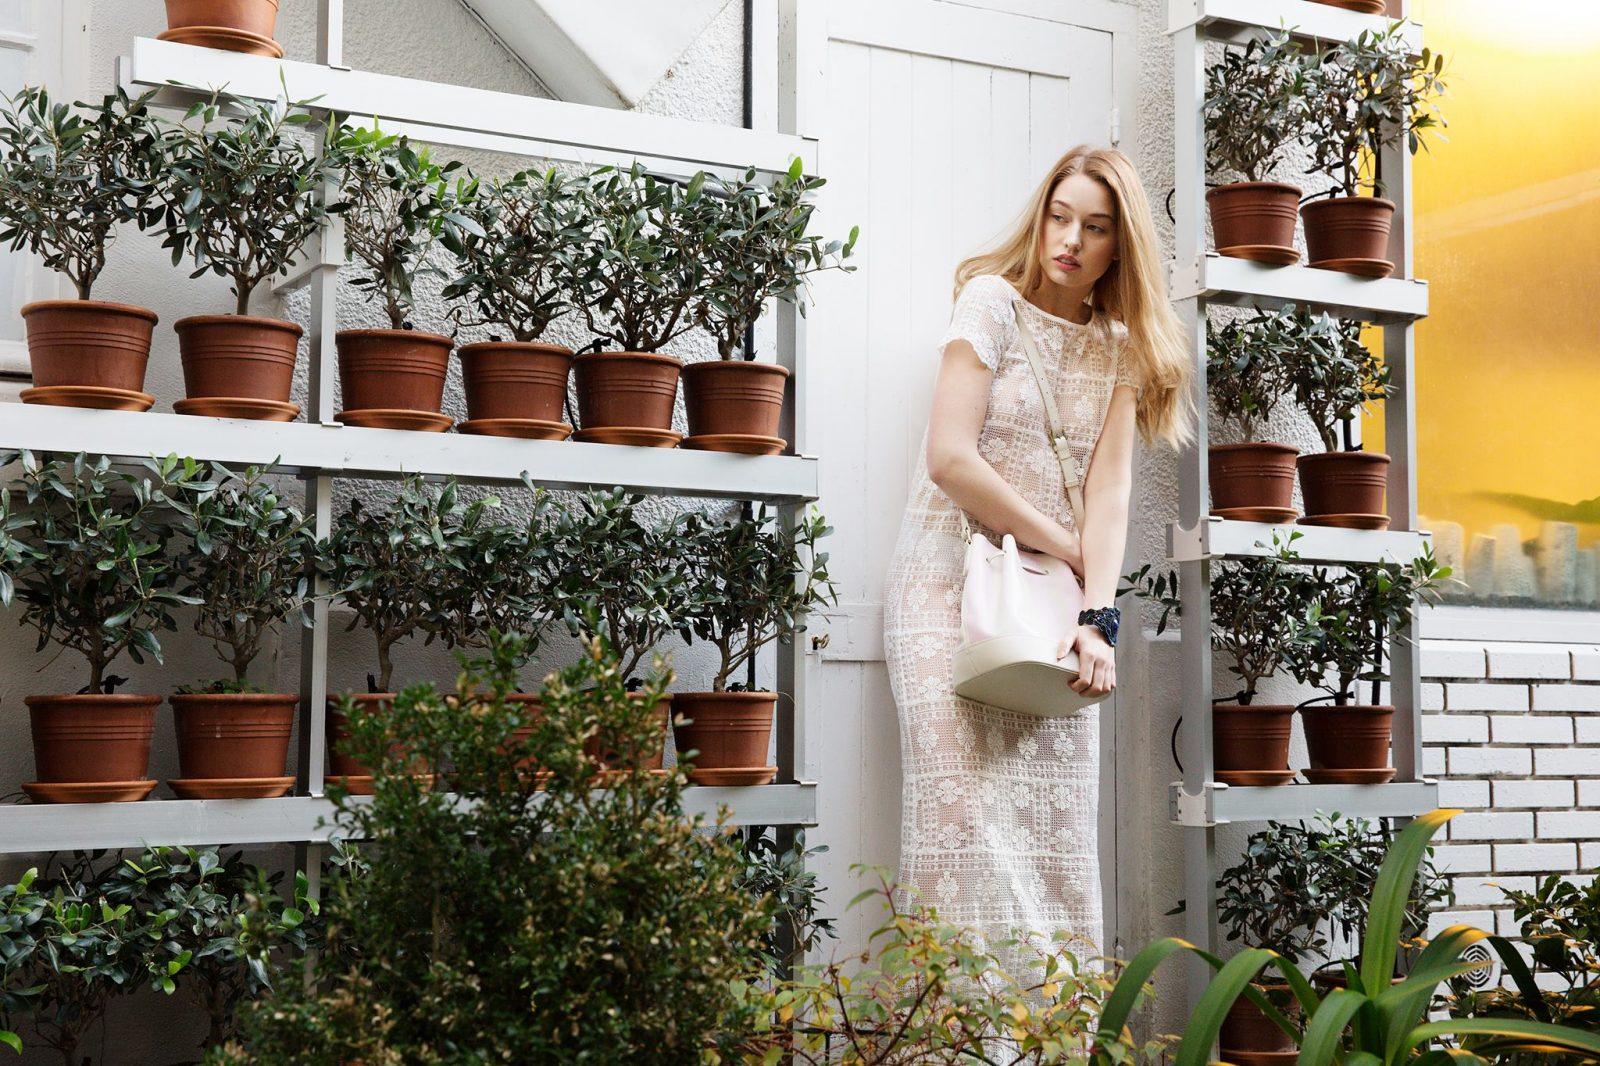 L'habibliothèque eshop renting shopping designers